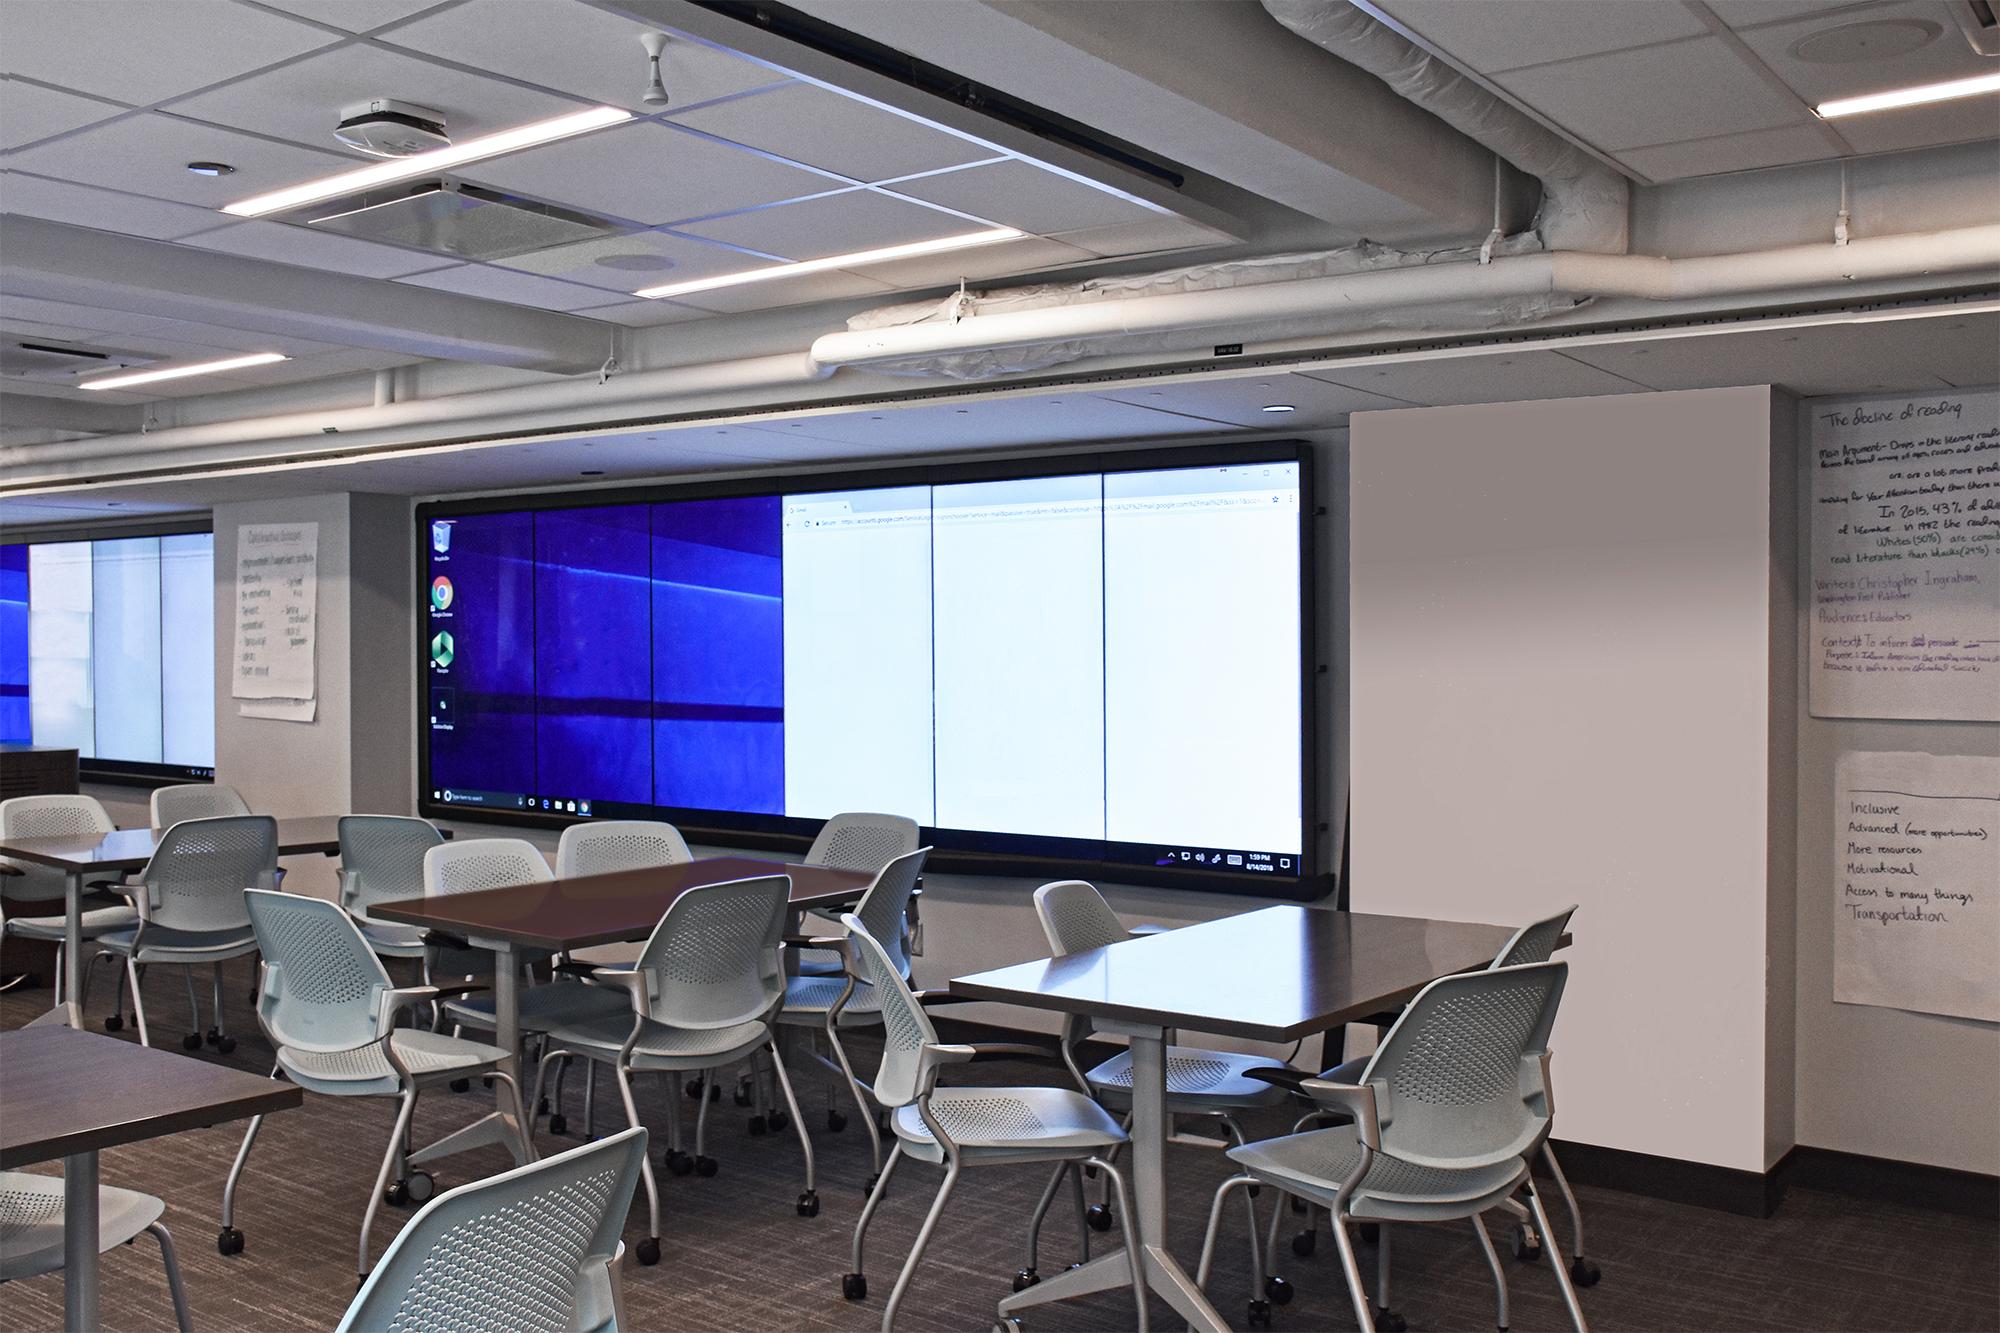 16th Floor Classroom Screens